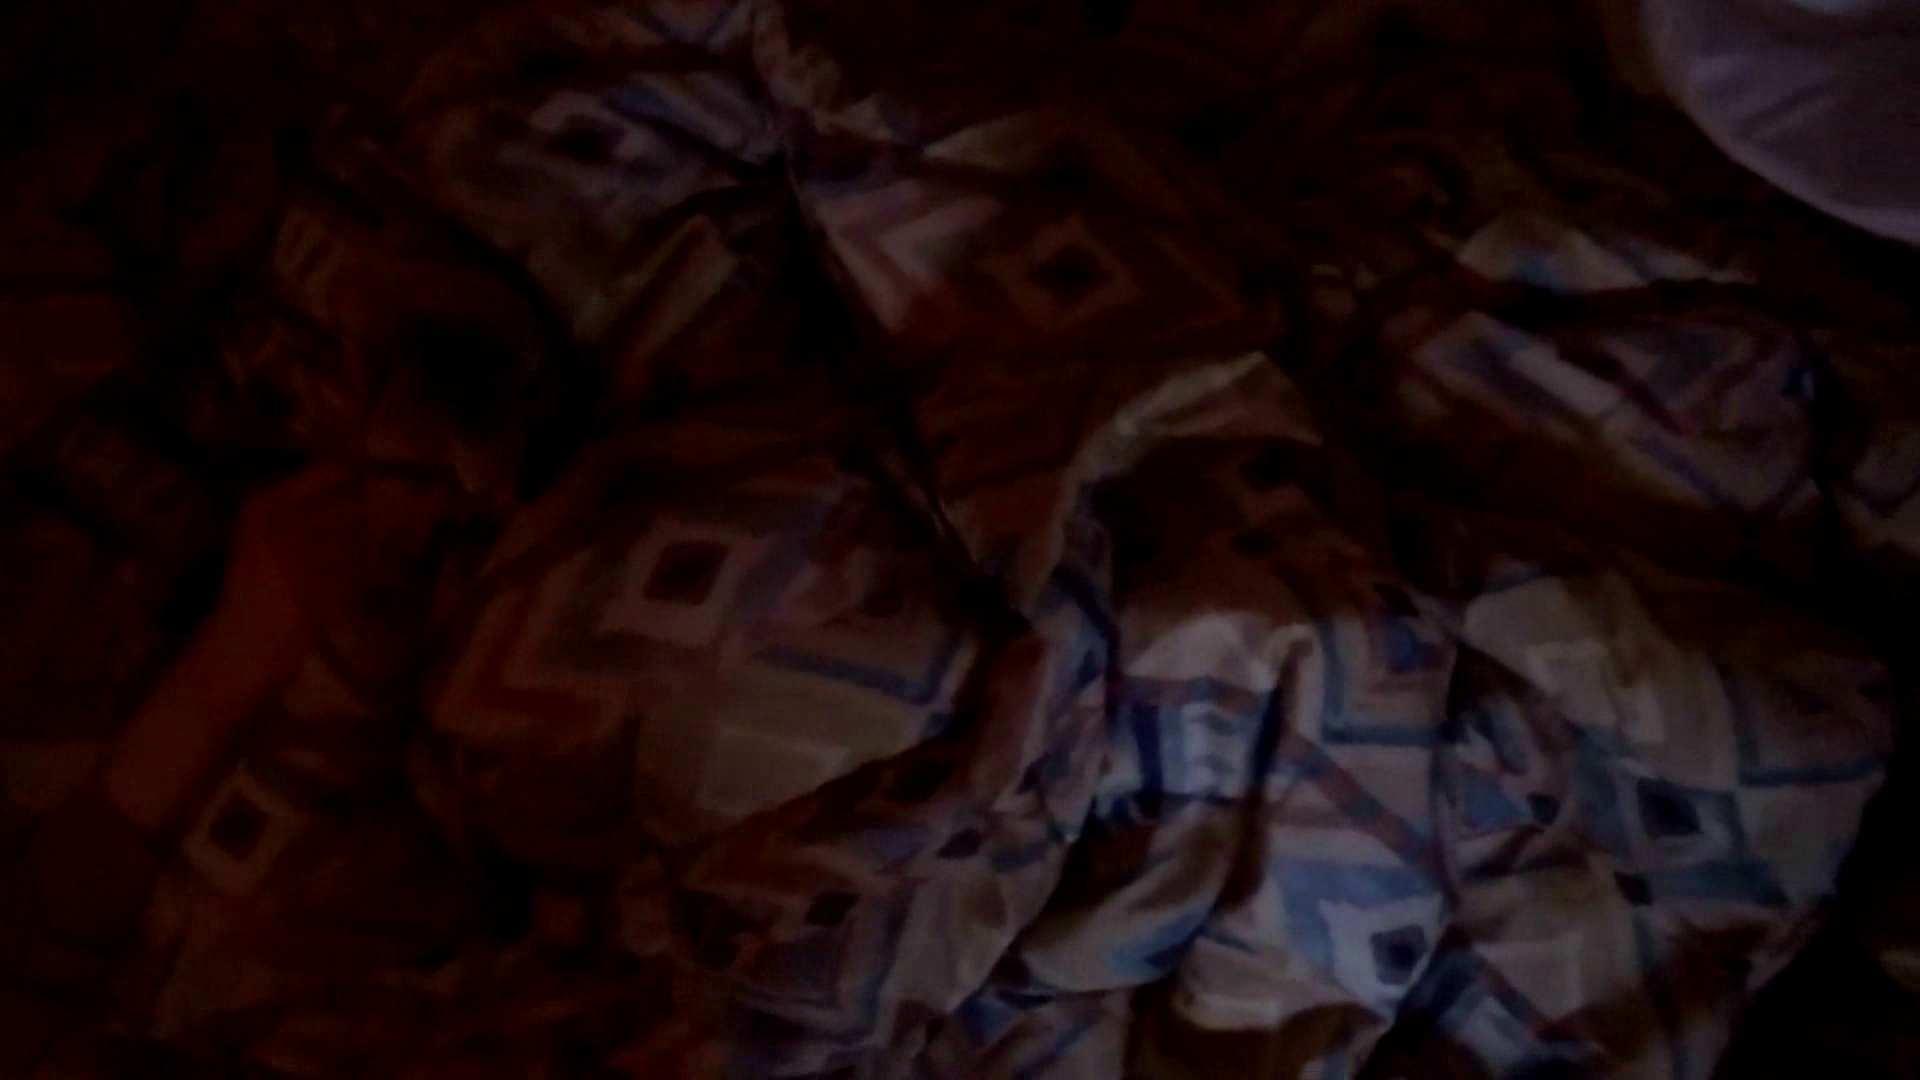 vol.31 【KTちゃん】現役JD居酒屋アルバイト 3回目? 美肌 AV無料動画キャプチャ 54画像 4